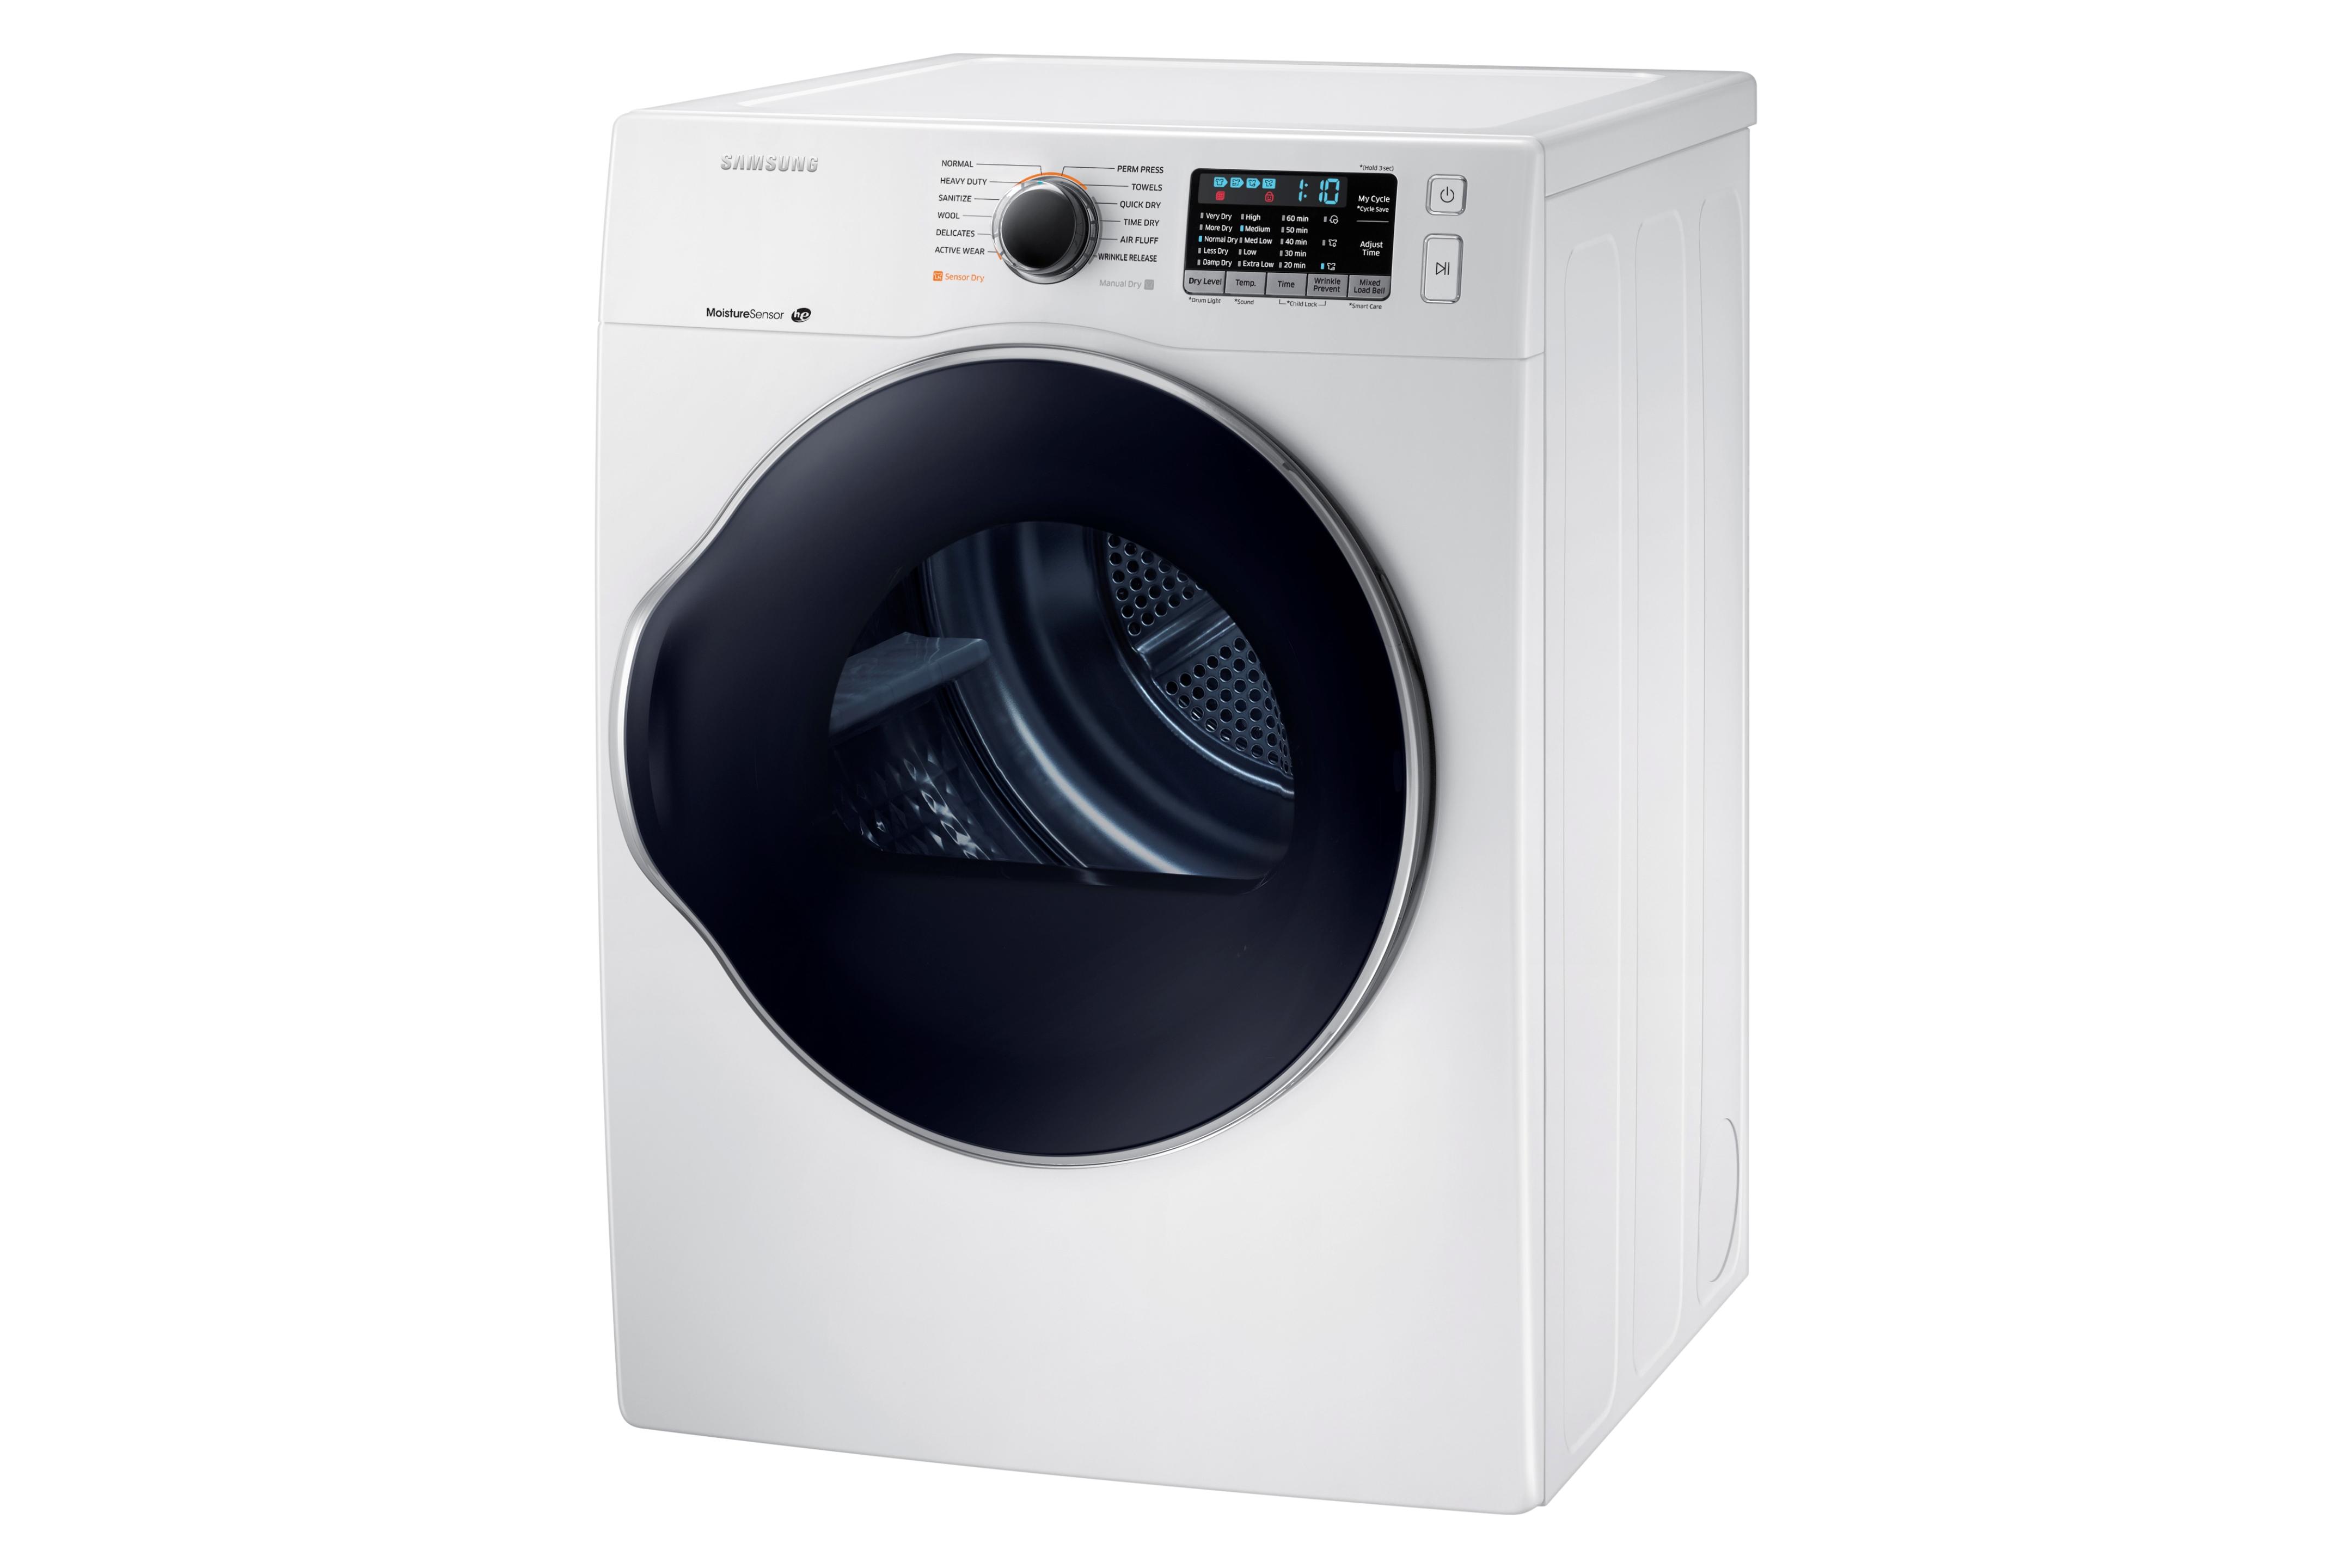 Samsung DV22K6800EW 4.0 cu. ft. Capacity Electric Dryer White